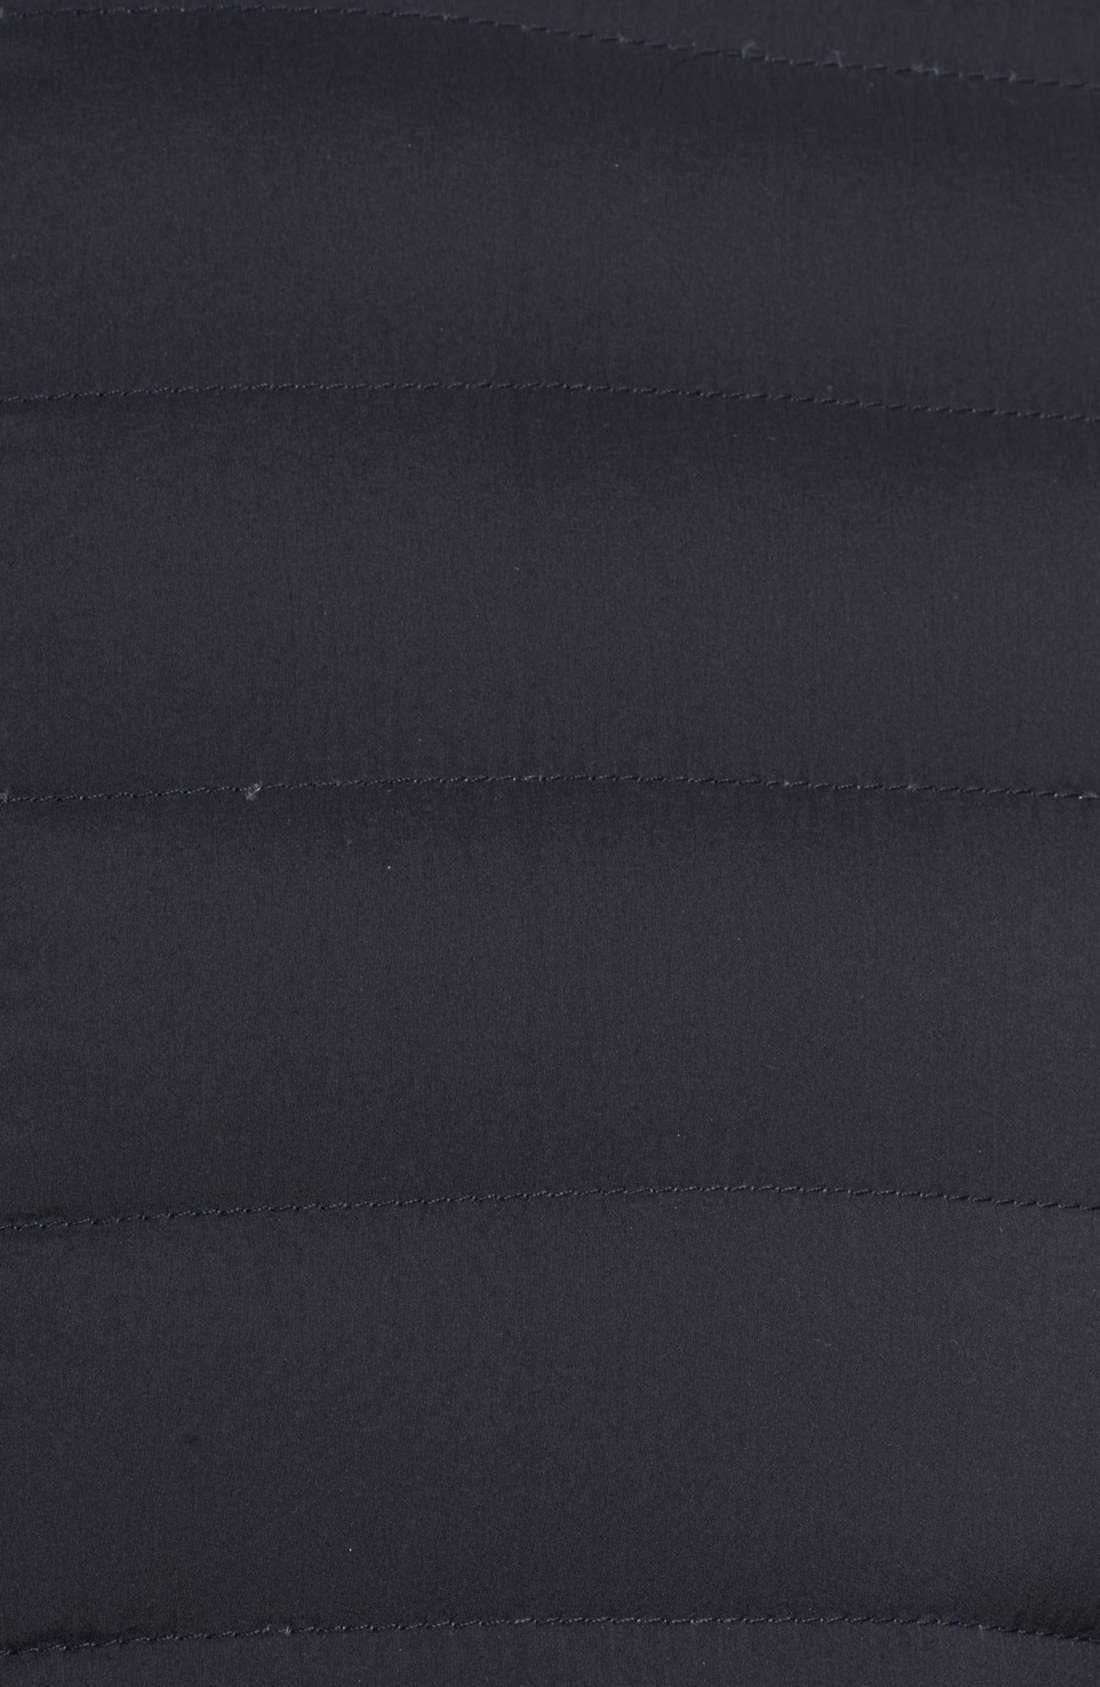 Alternate Image 3  - rag & bone 'Chelsea' Water Repellent Quilted Jacket